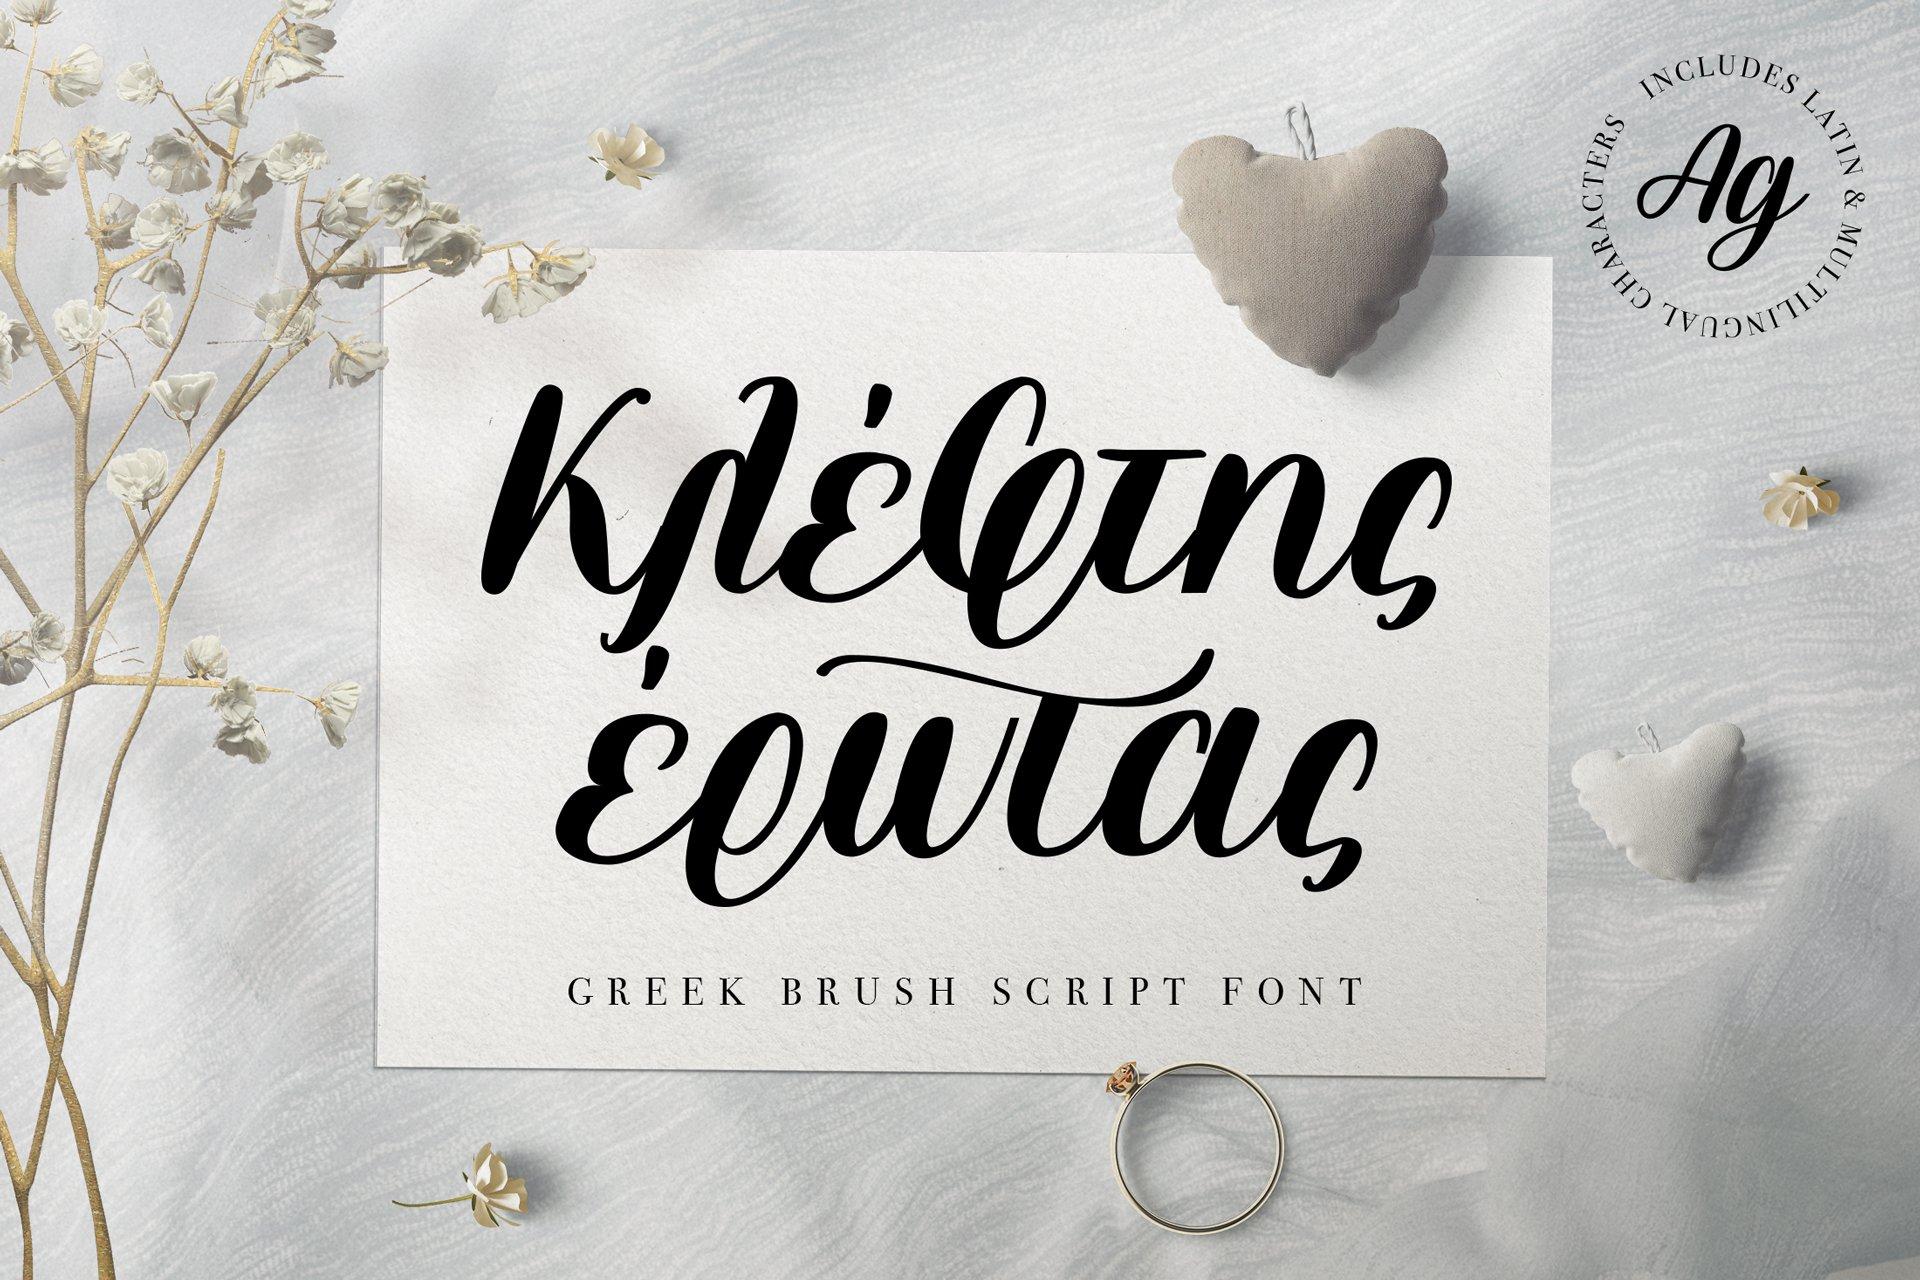 Kleftis Erotas Greek script font example image 1